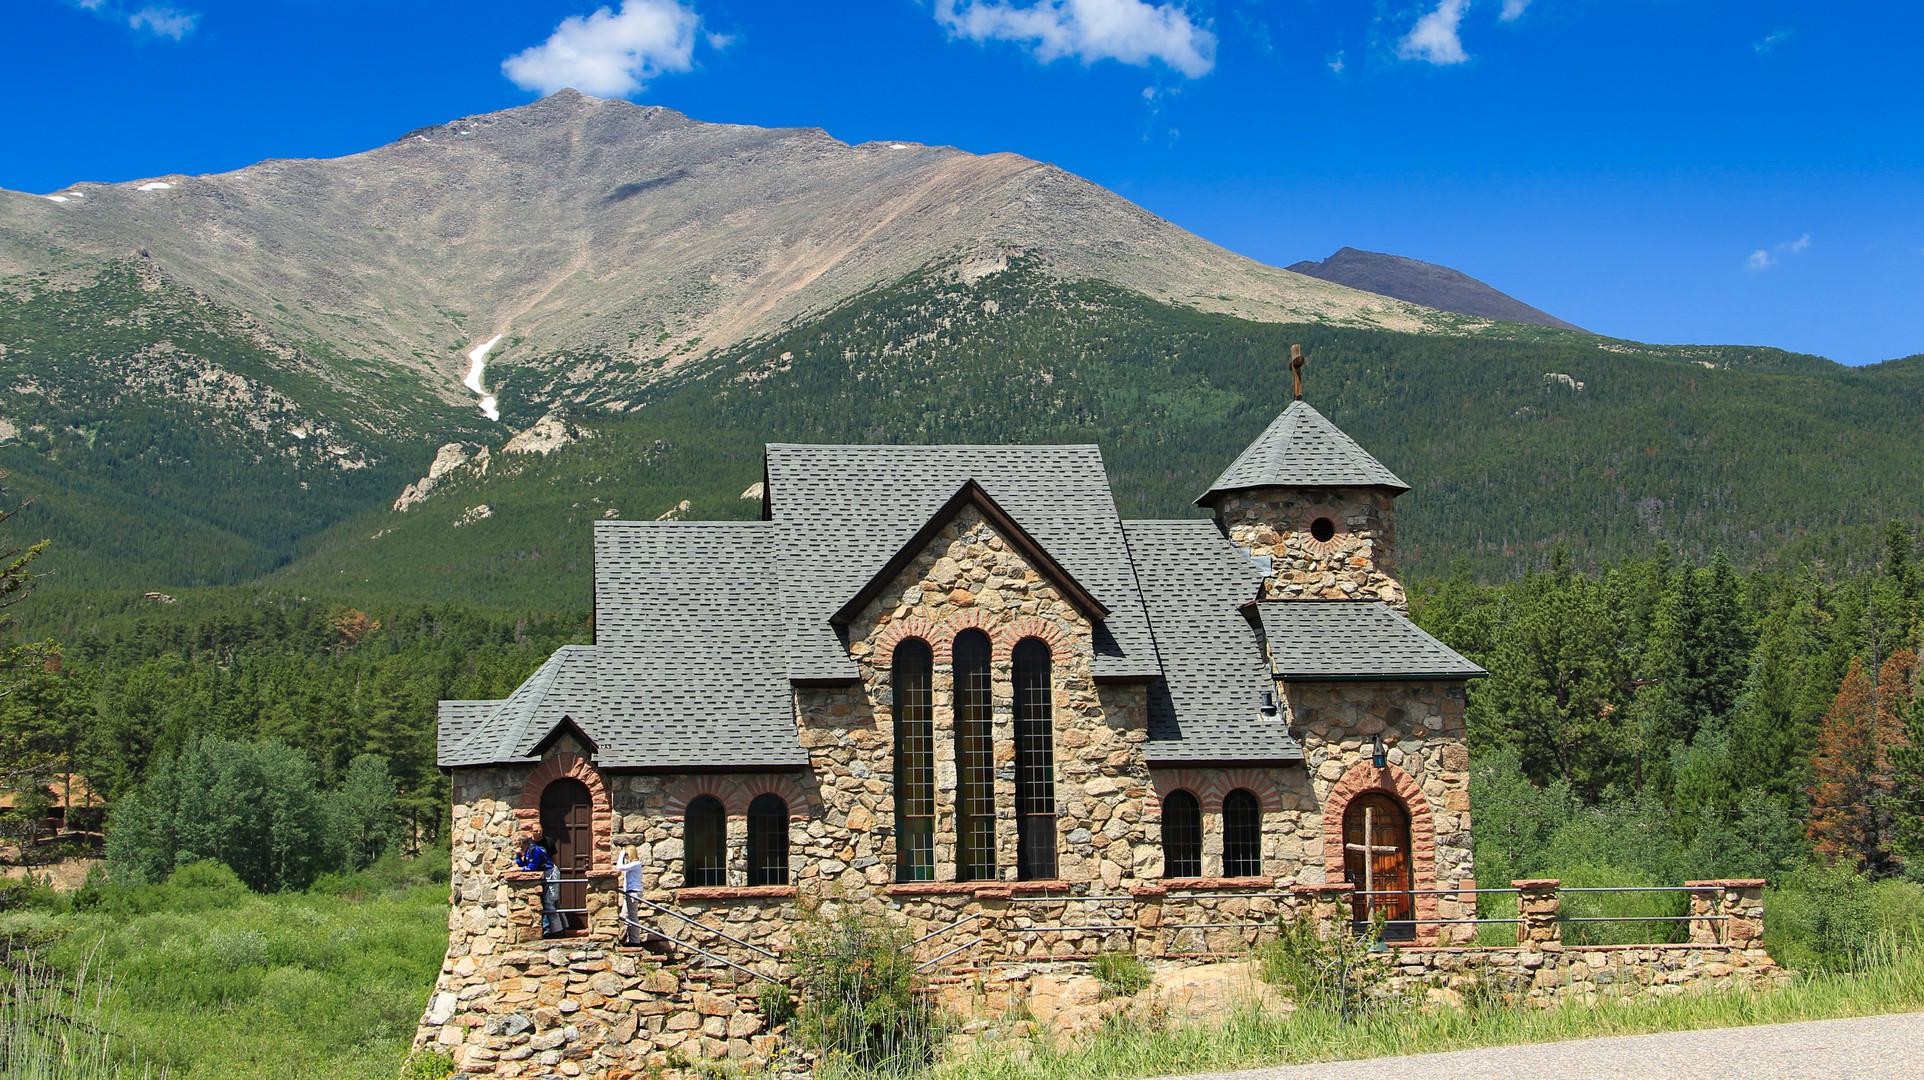 Kirche am Peak to Peak Highway